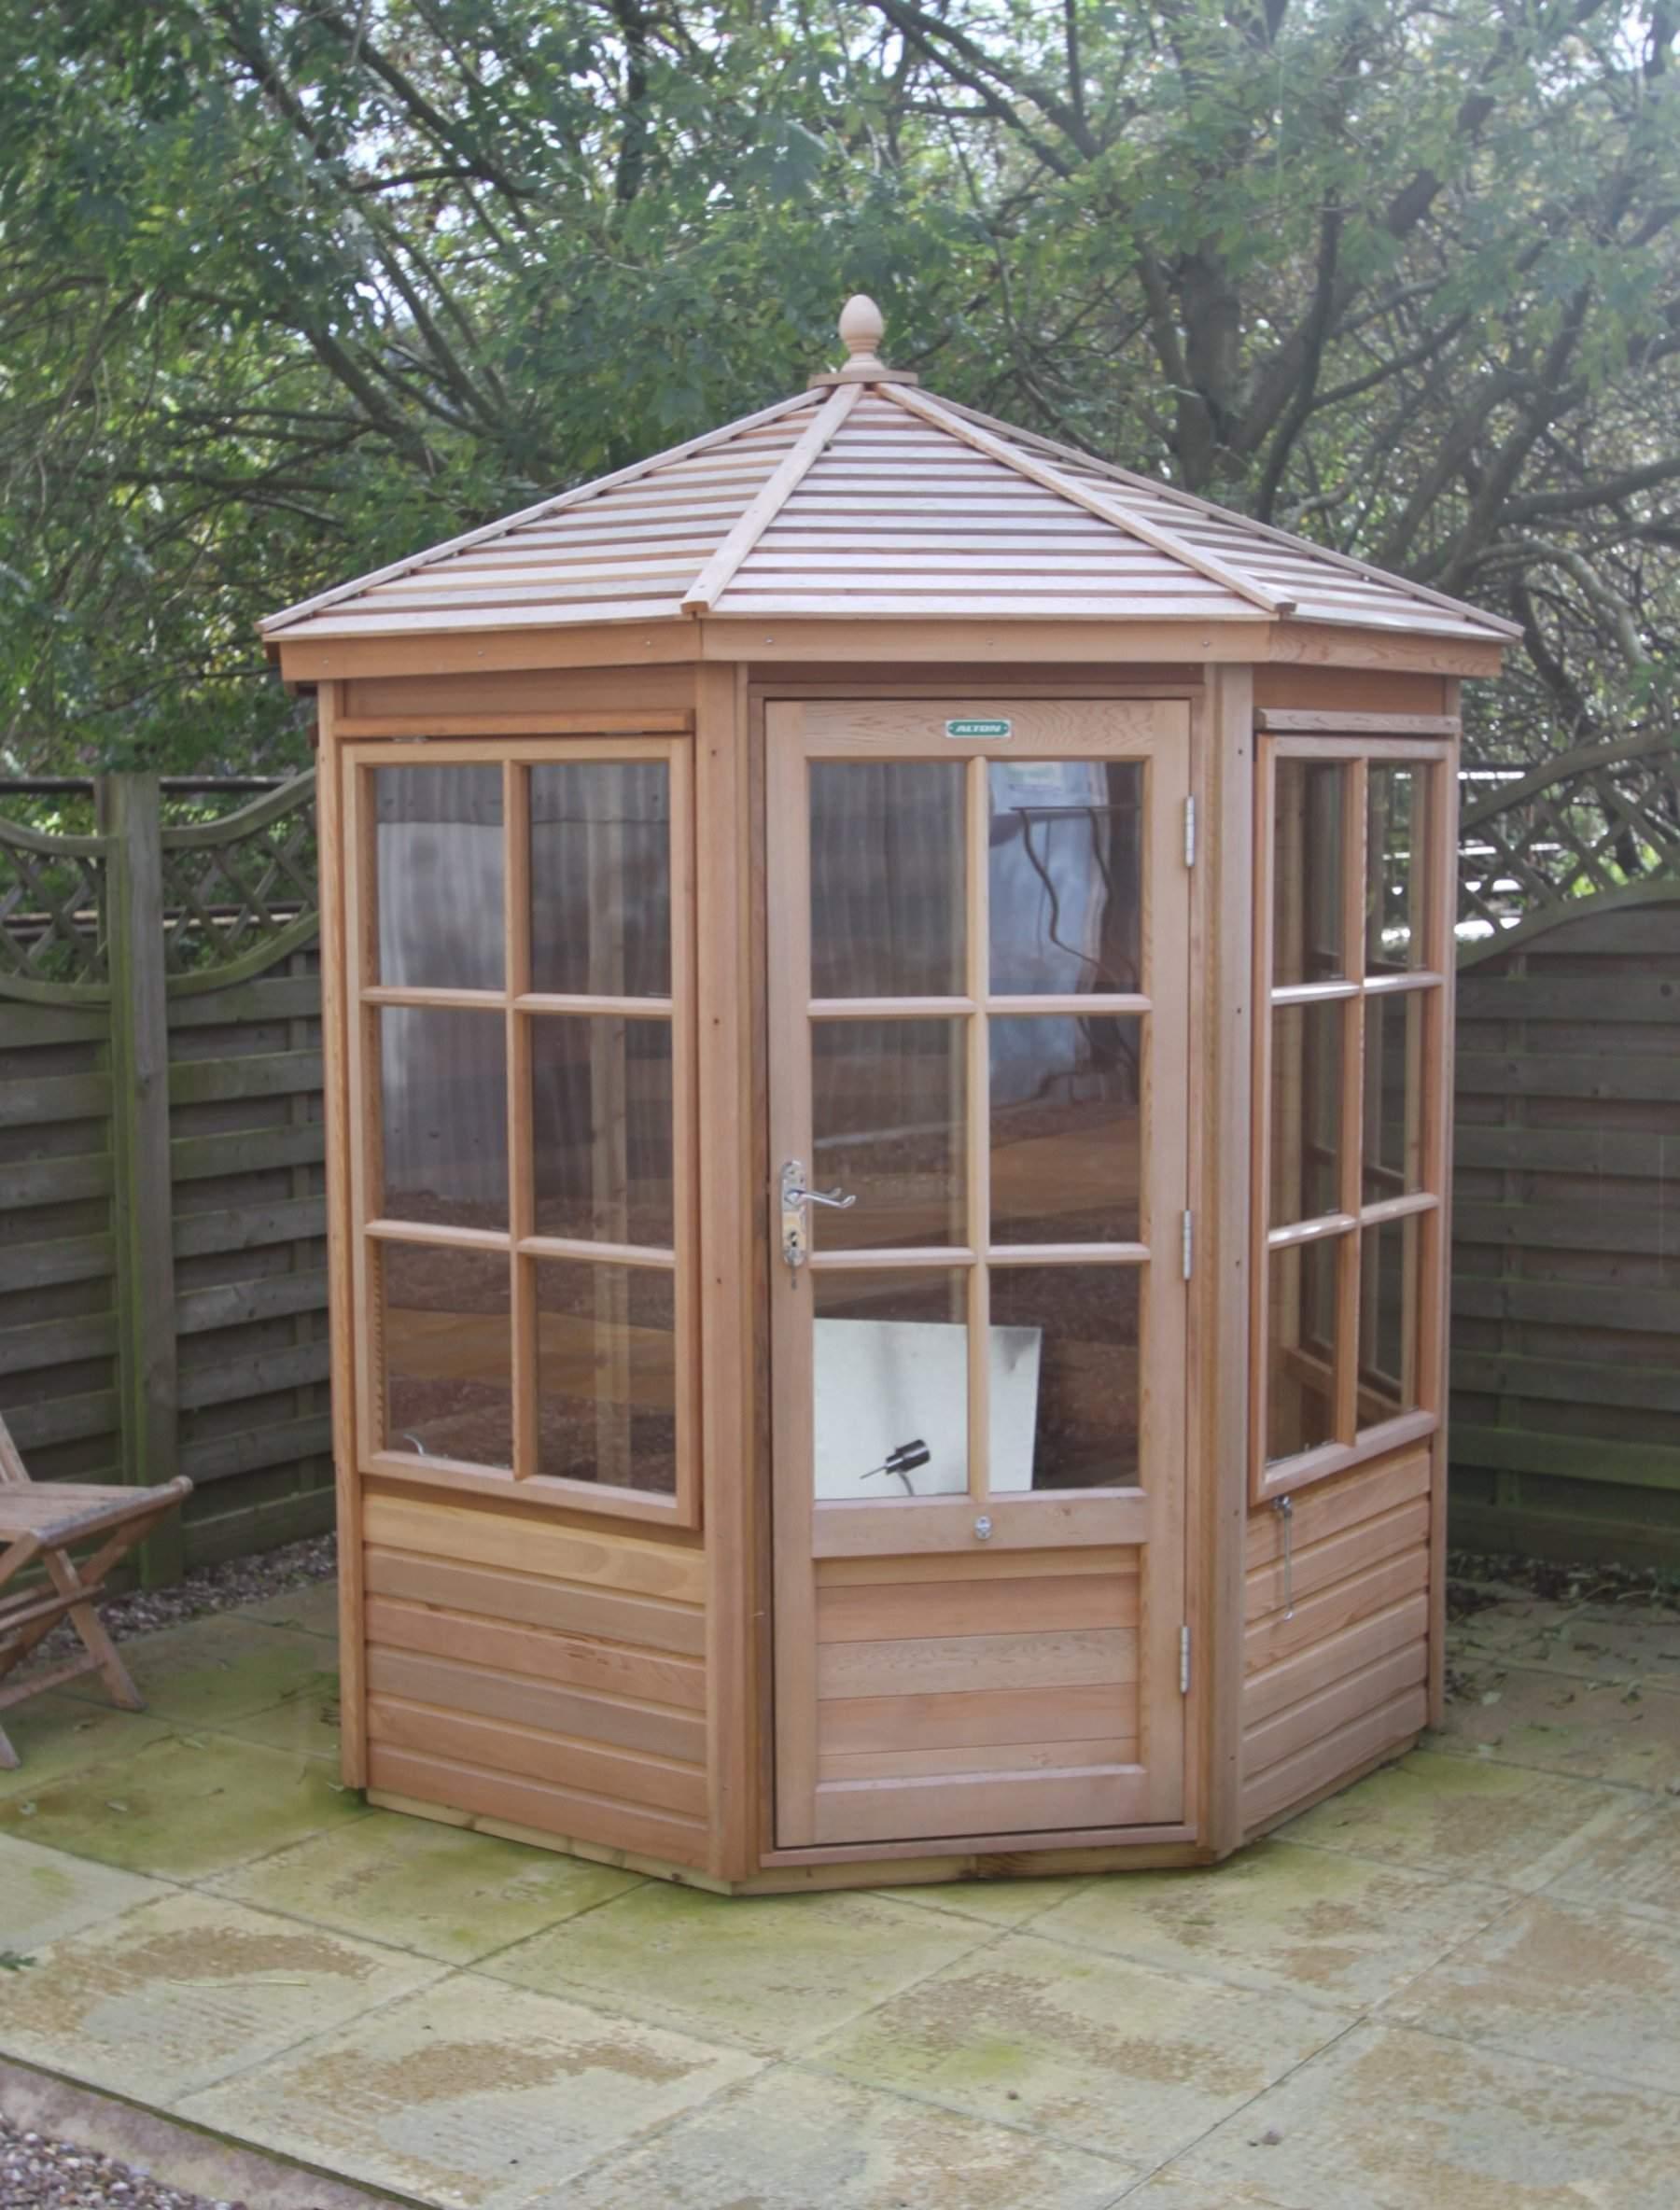 Shipton 6x6 Summer House Plus (Cedar Slatted Roof)